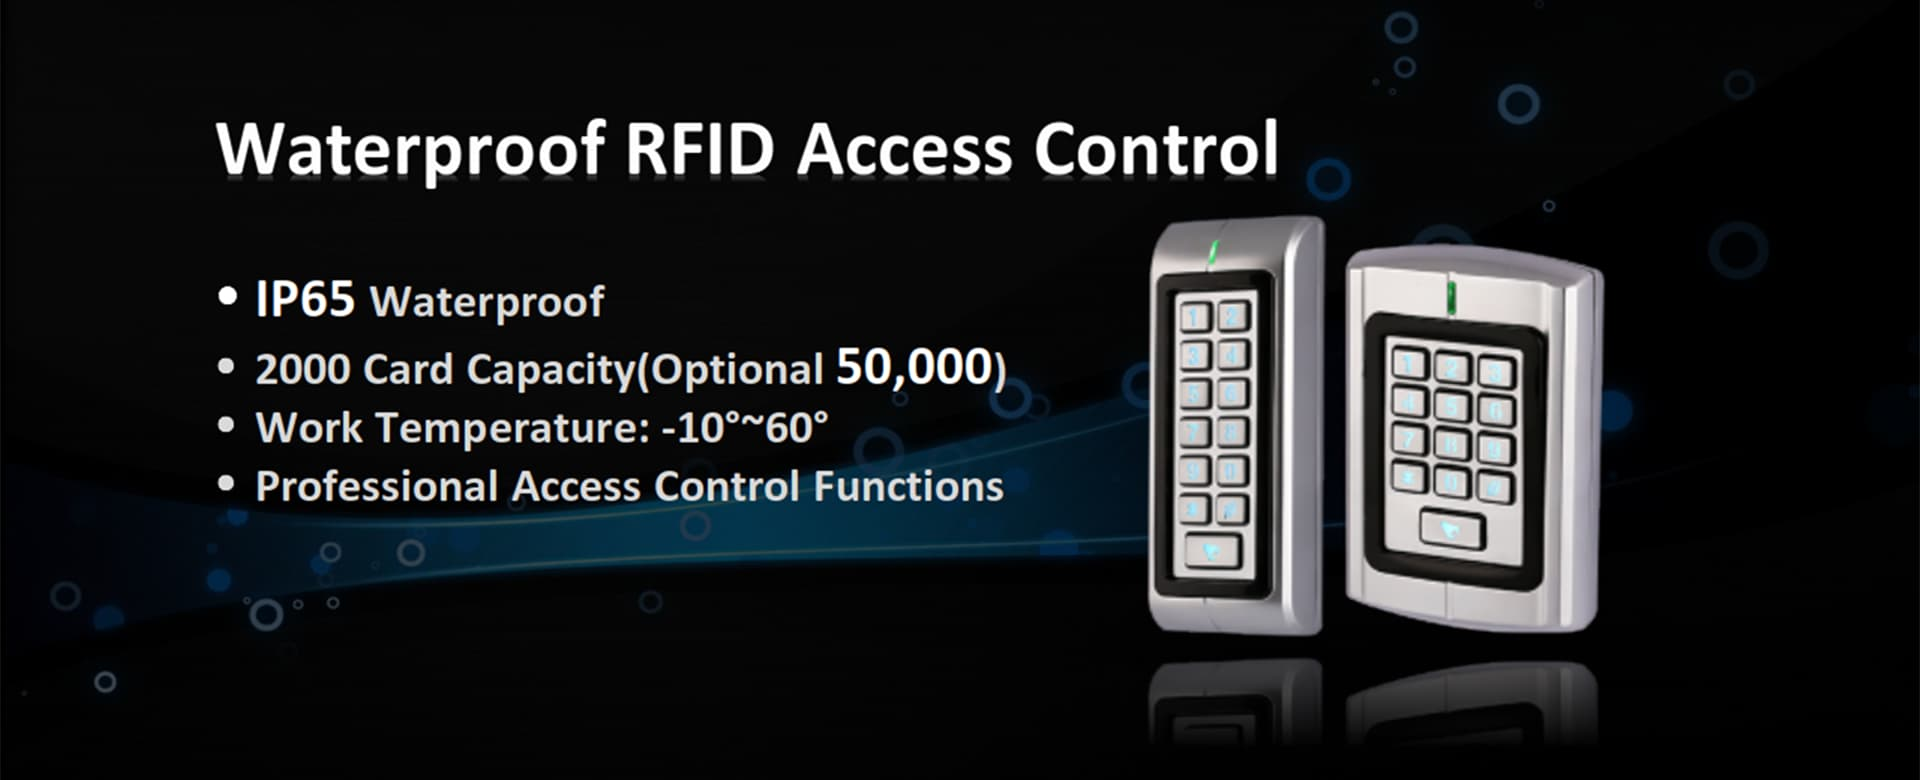 RT370-Waterproof-Access-Control-Banner-s